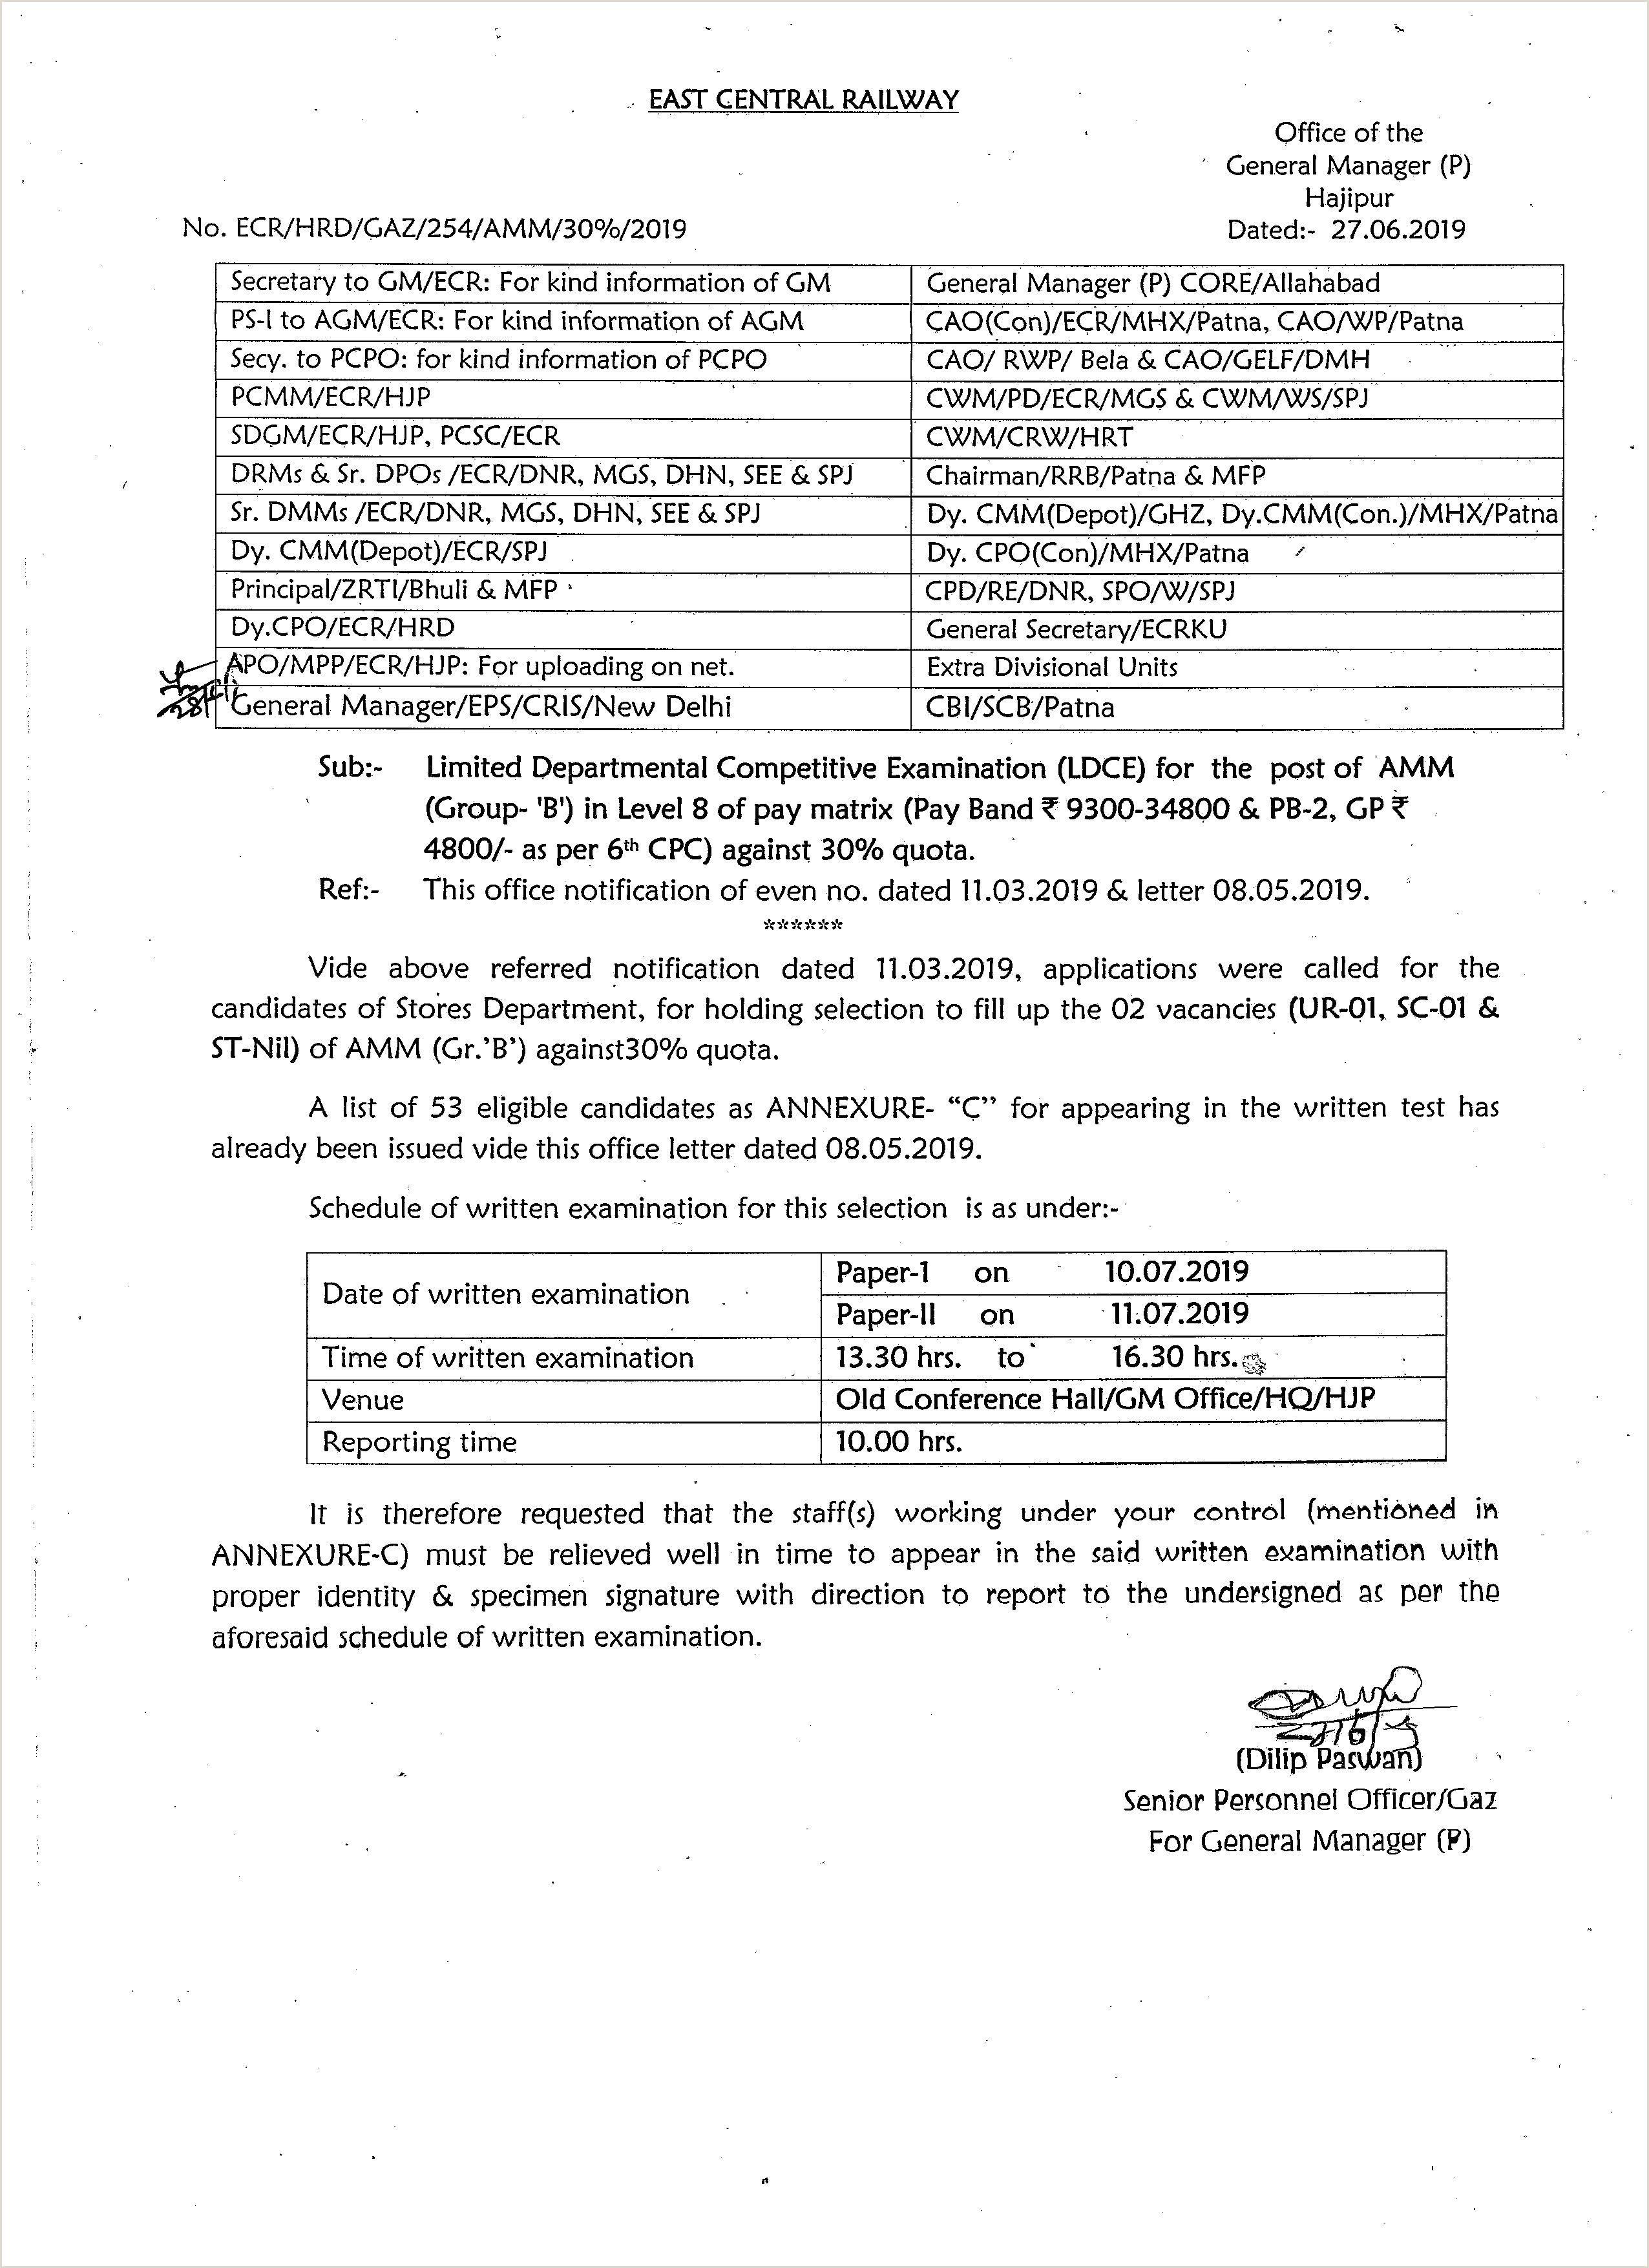 Cv Examples For Railway Job Railway Jobs Cv Examples Engineering Resume Templates